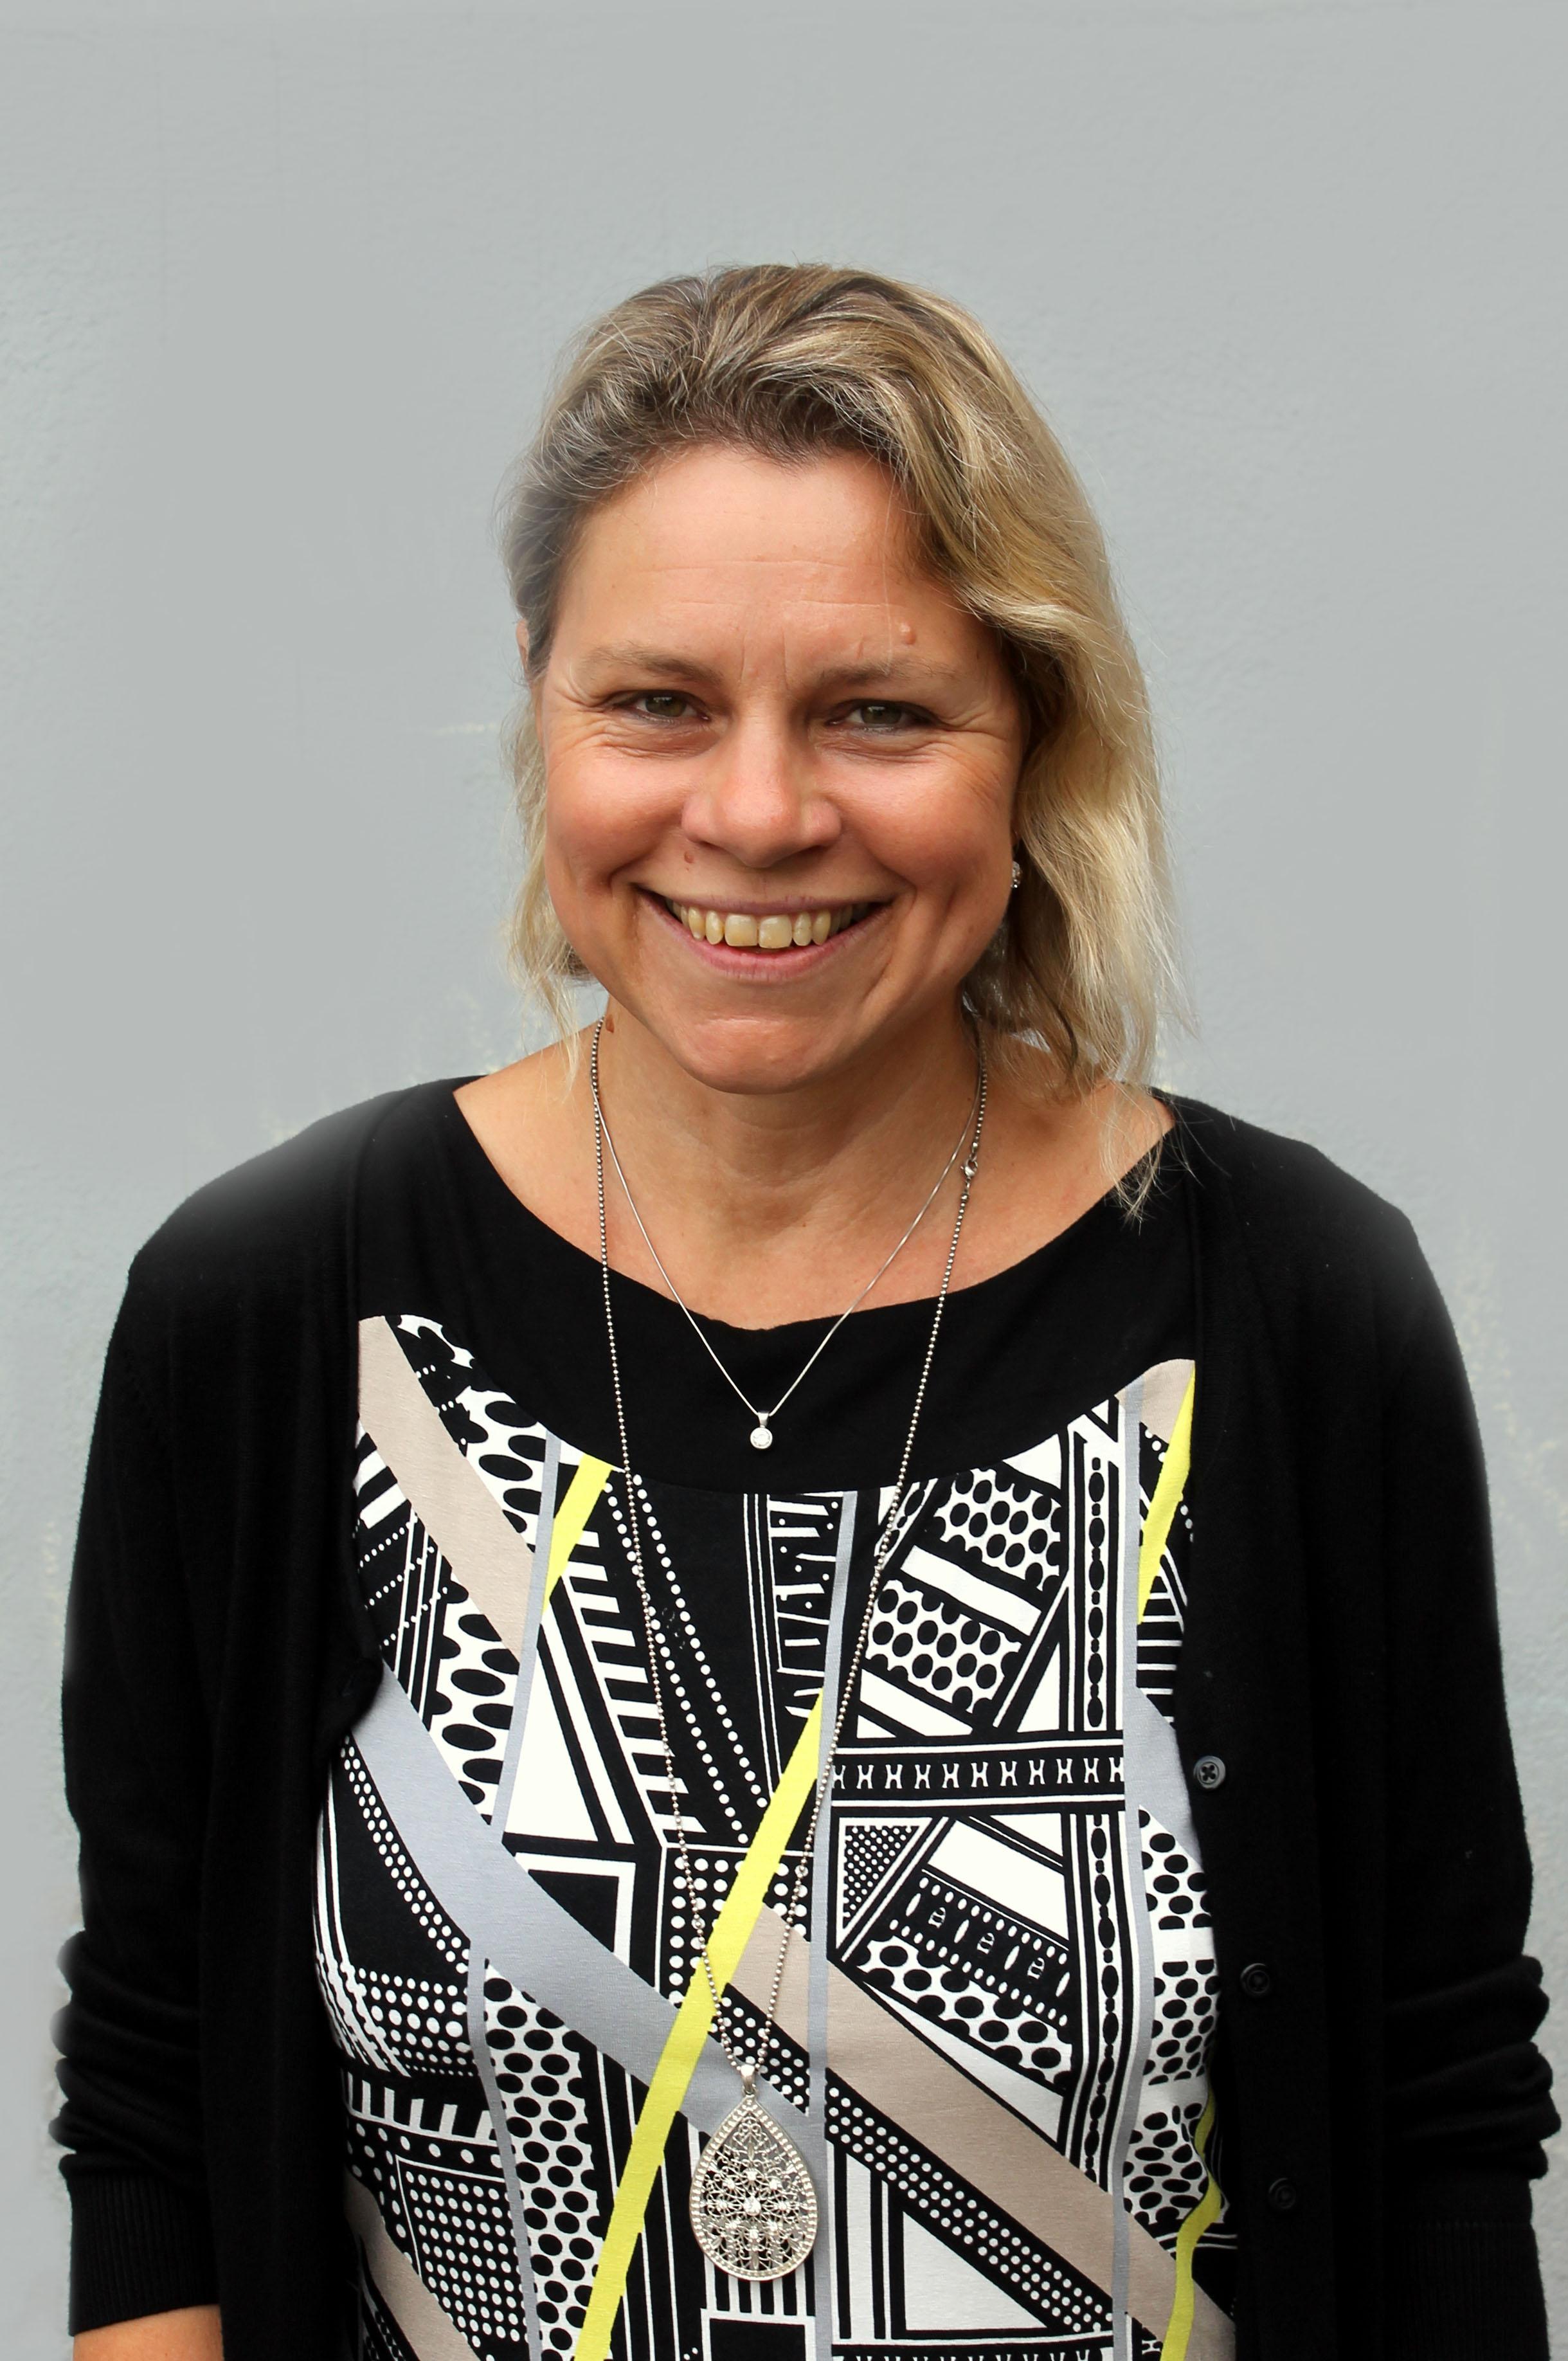 Susanne Bratin-Hahn